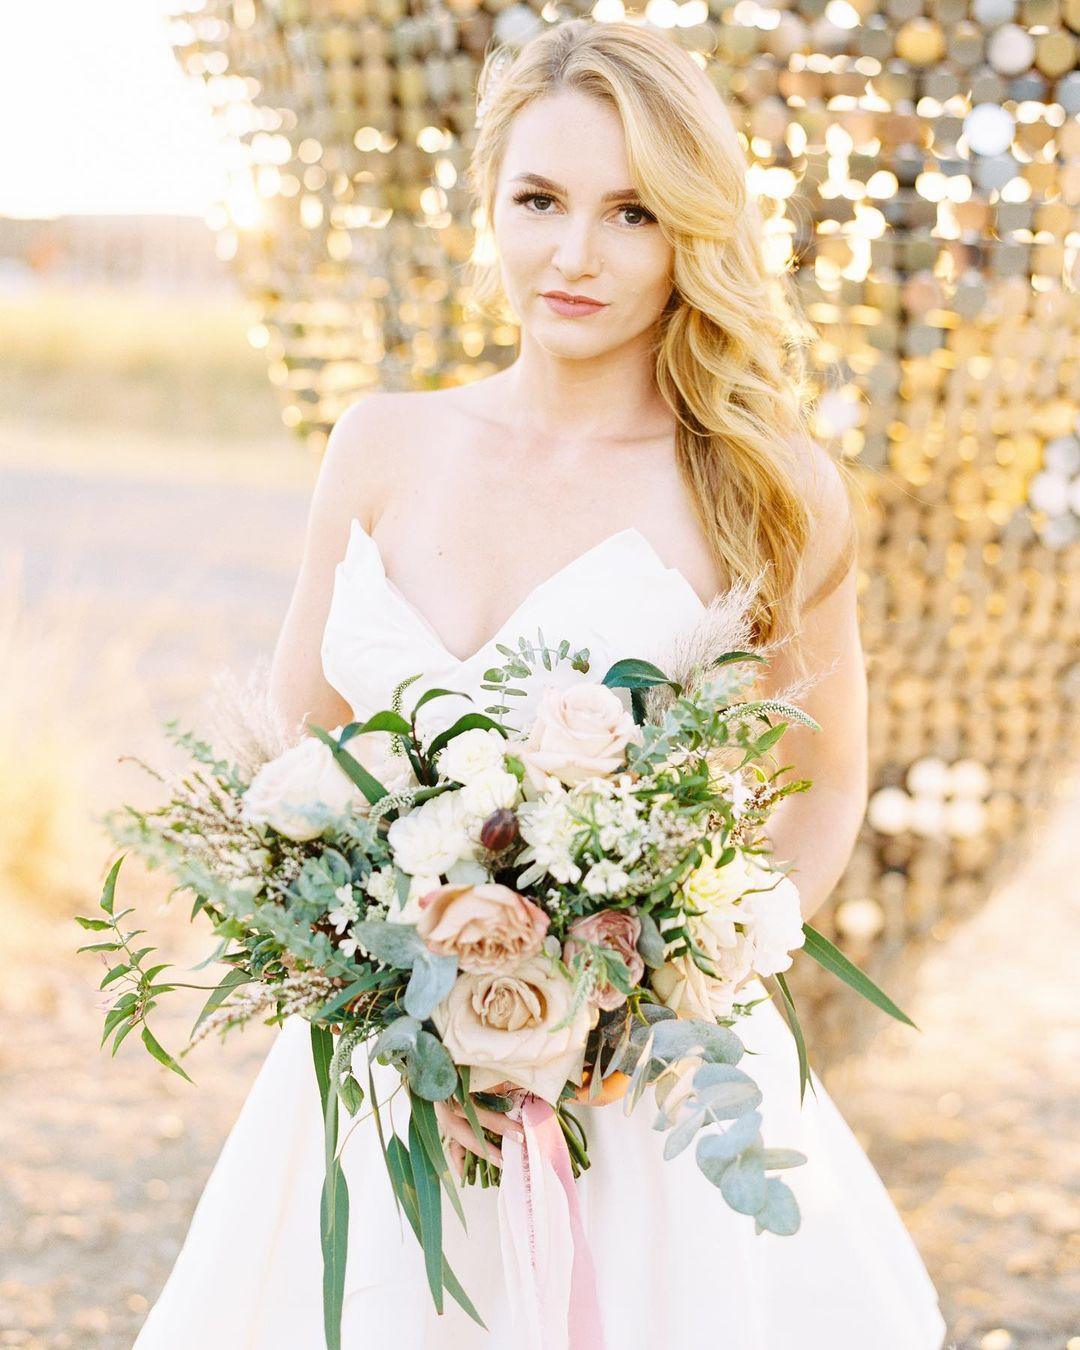 Bridge holds wedding bouquet designed by Bloom Sacramento